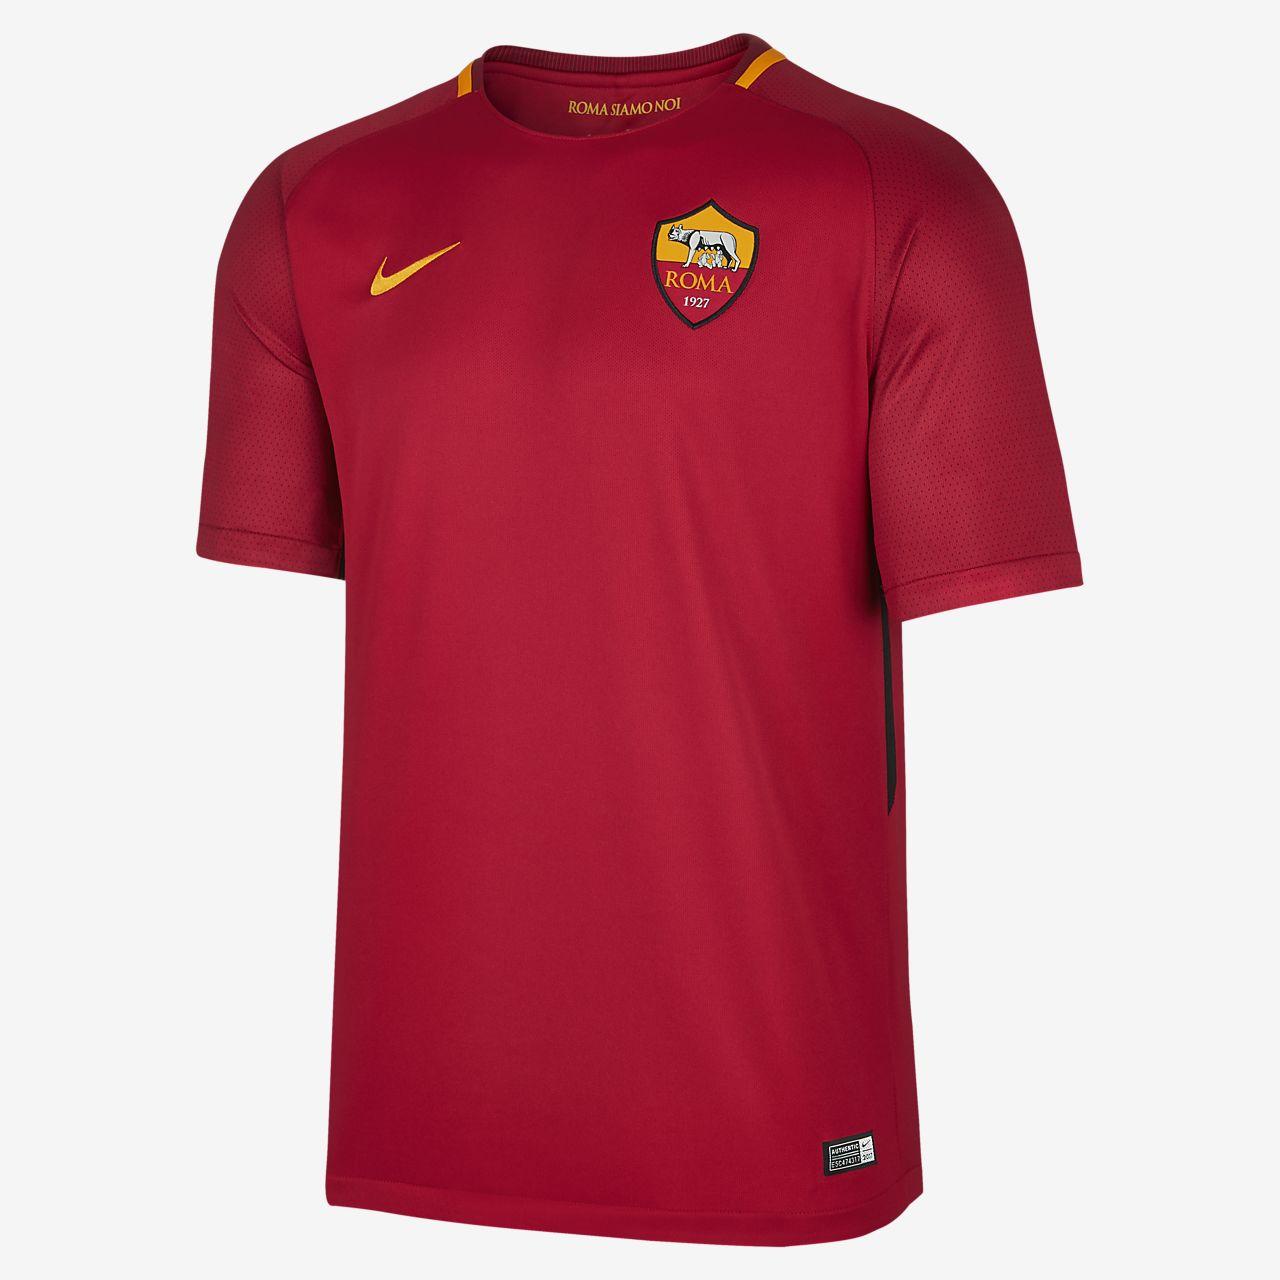 2017/18 A.S. Roma Stadium Home Men's Football Shirt